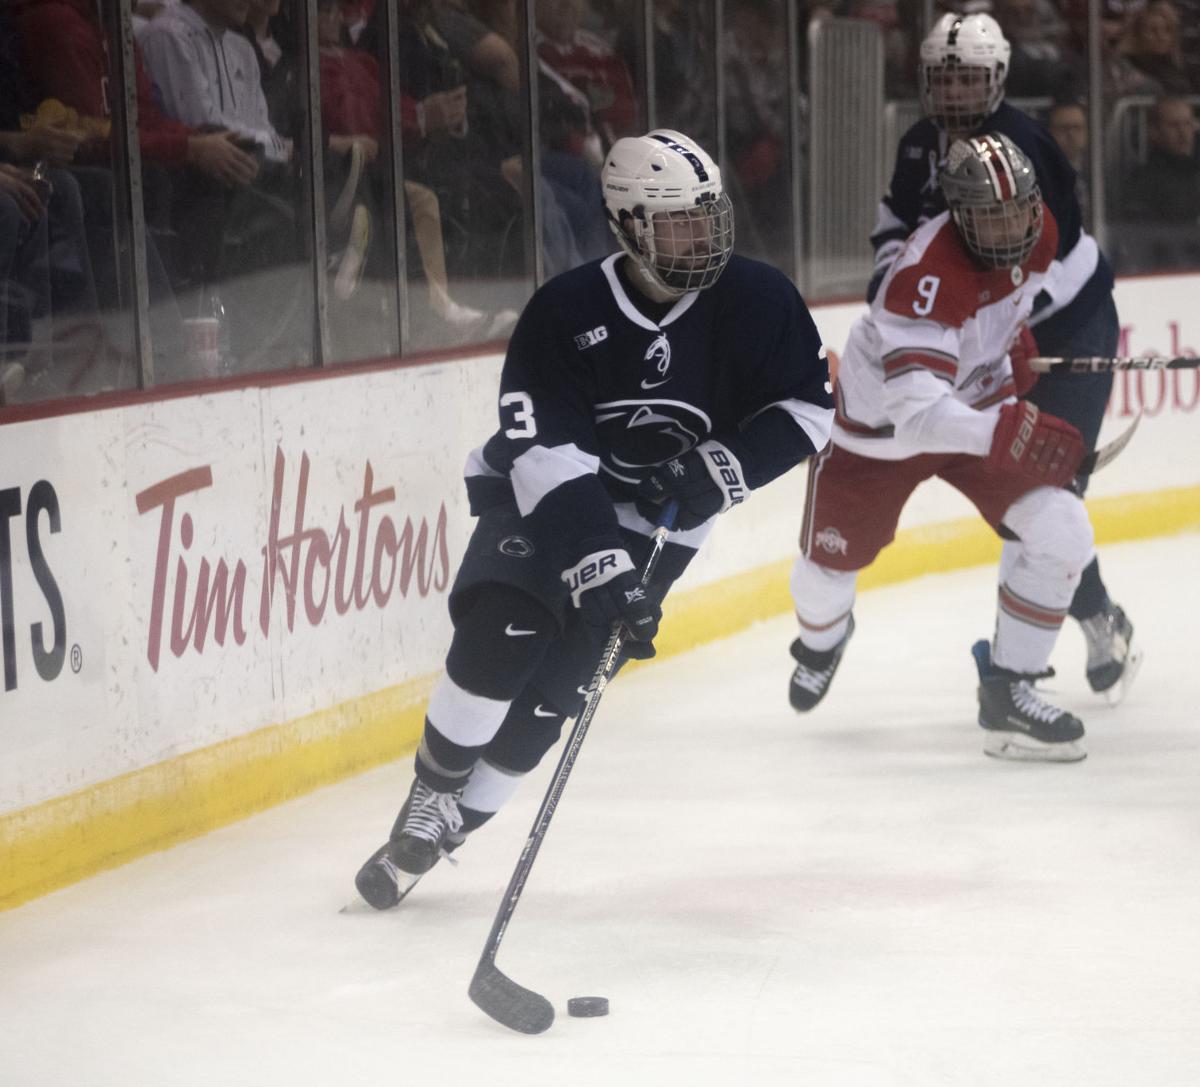 Big Ten Men's Ice Hockey Tournament Semifinals vs. Ohio State, DeNaples (3)